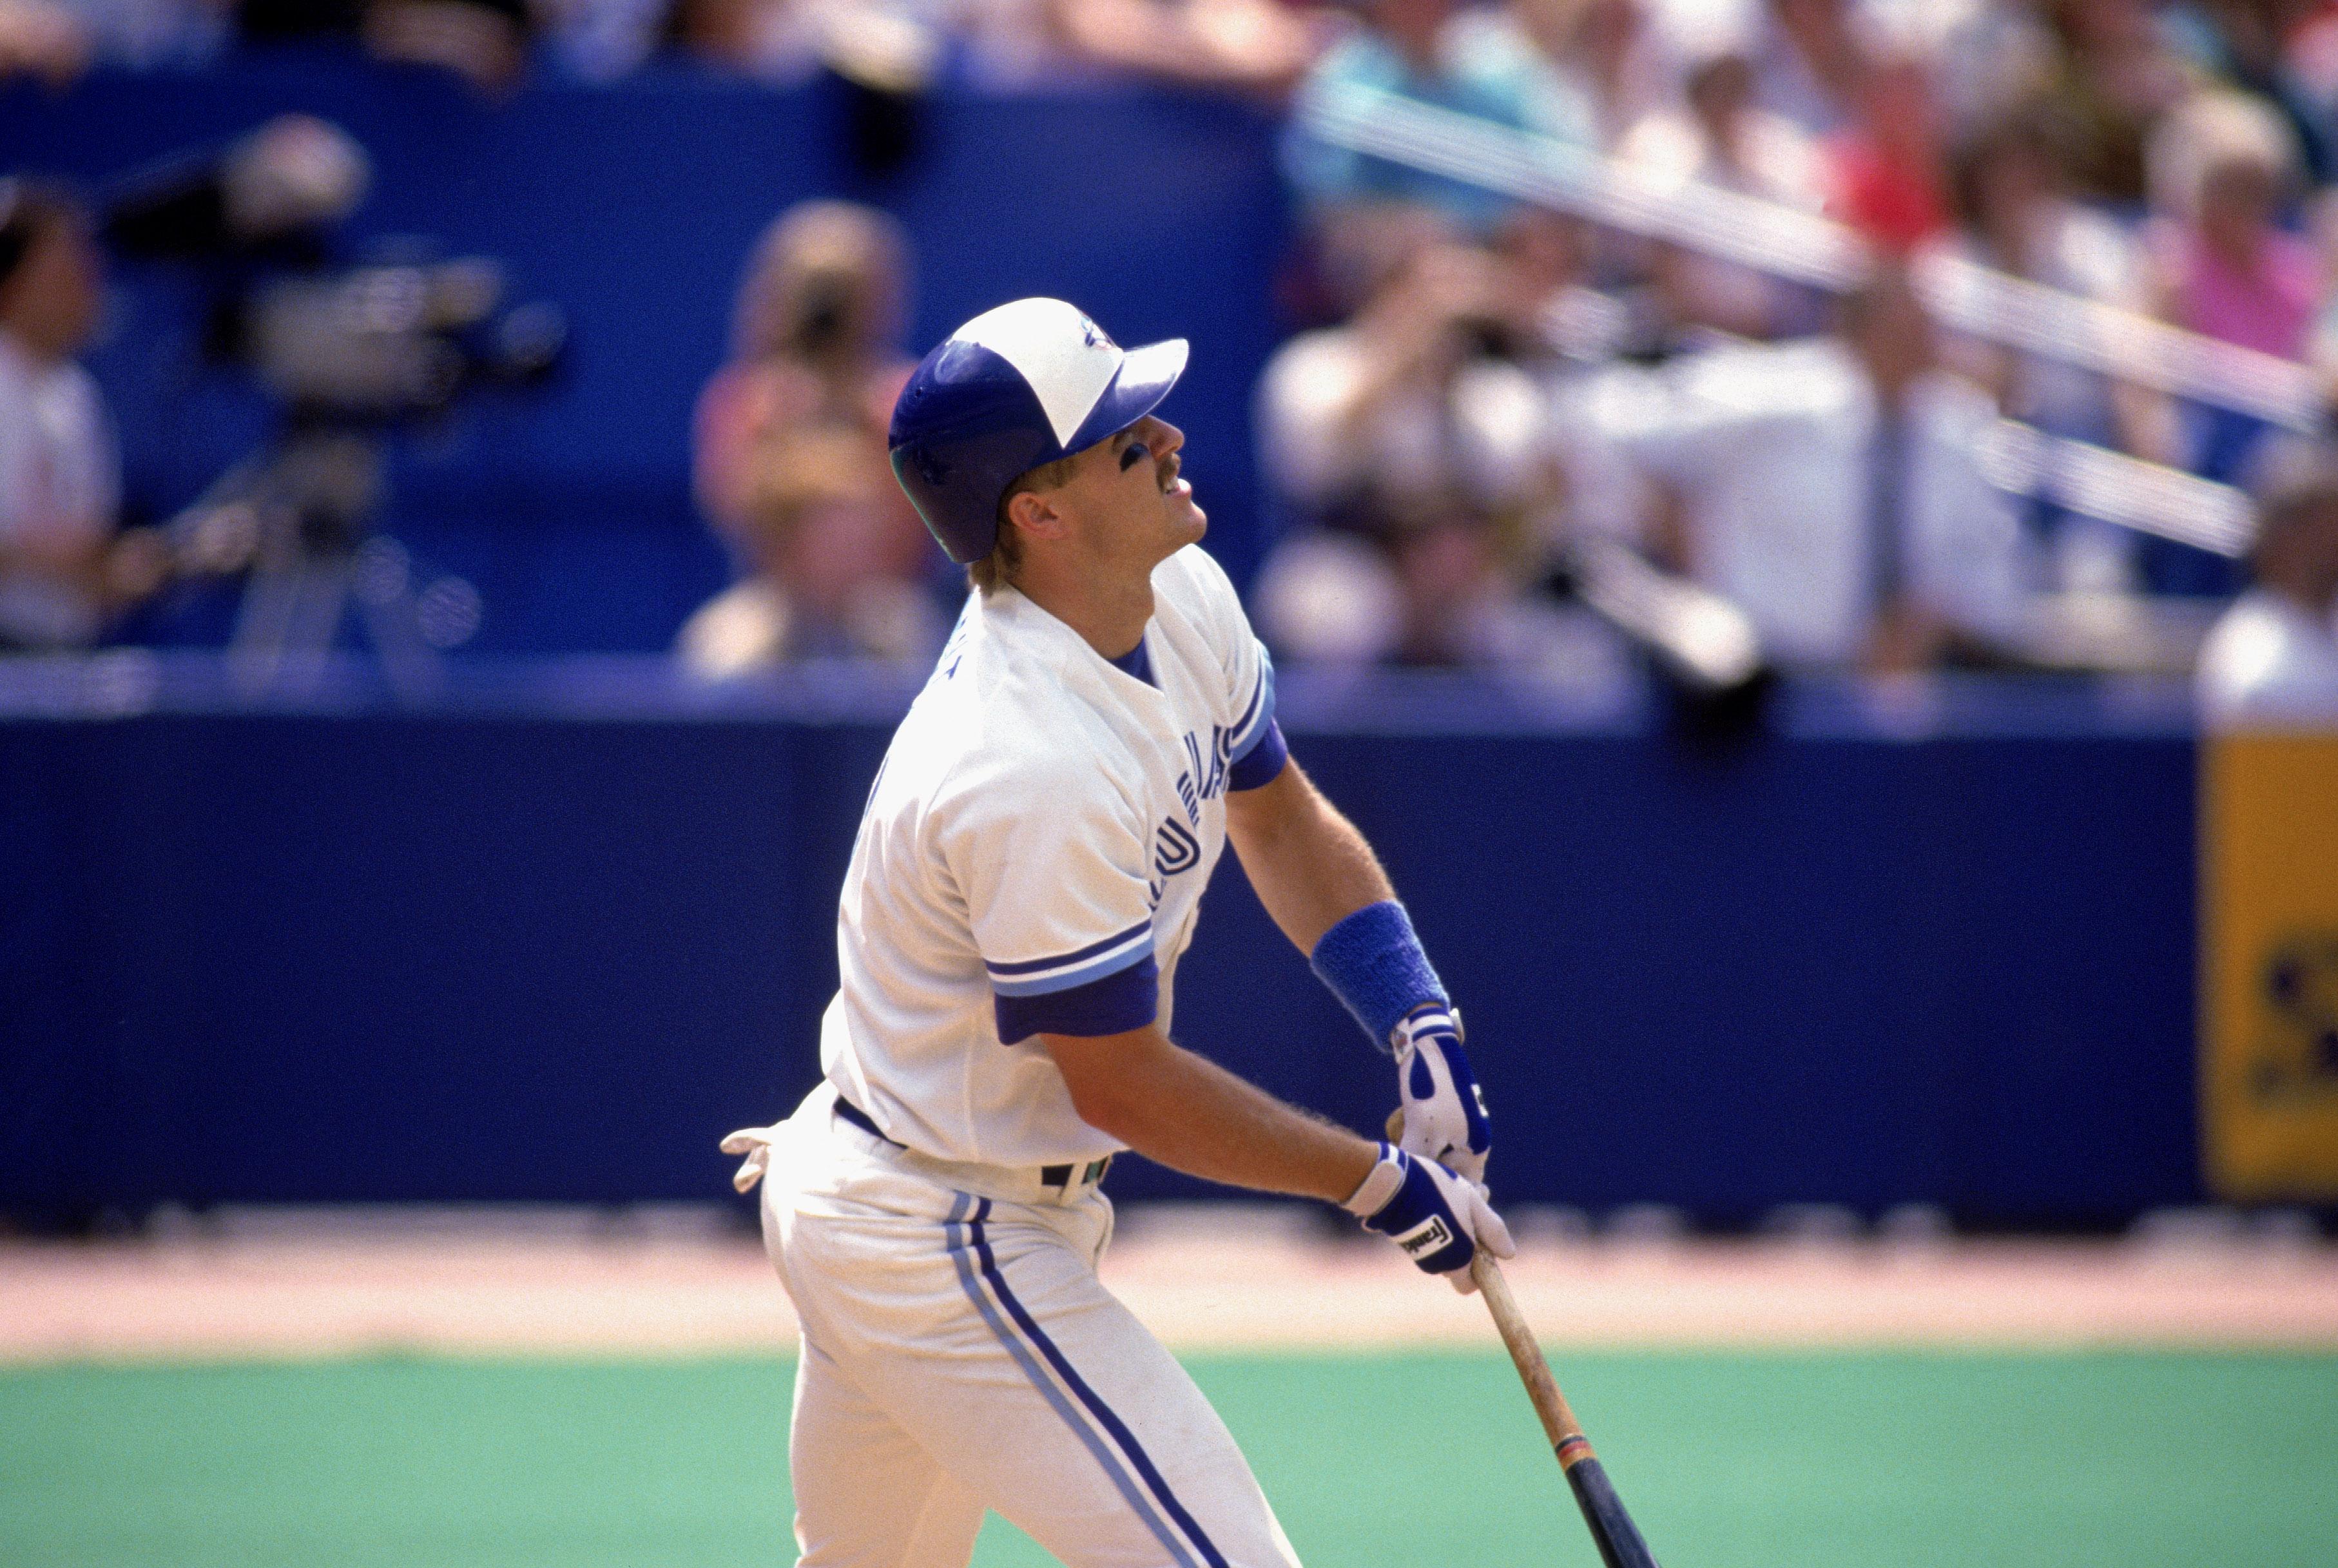 Jeff Kent of the Toronto Blue Jays